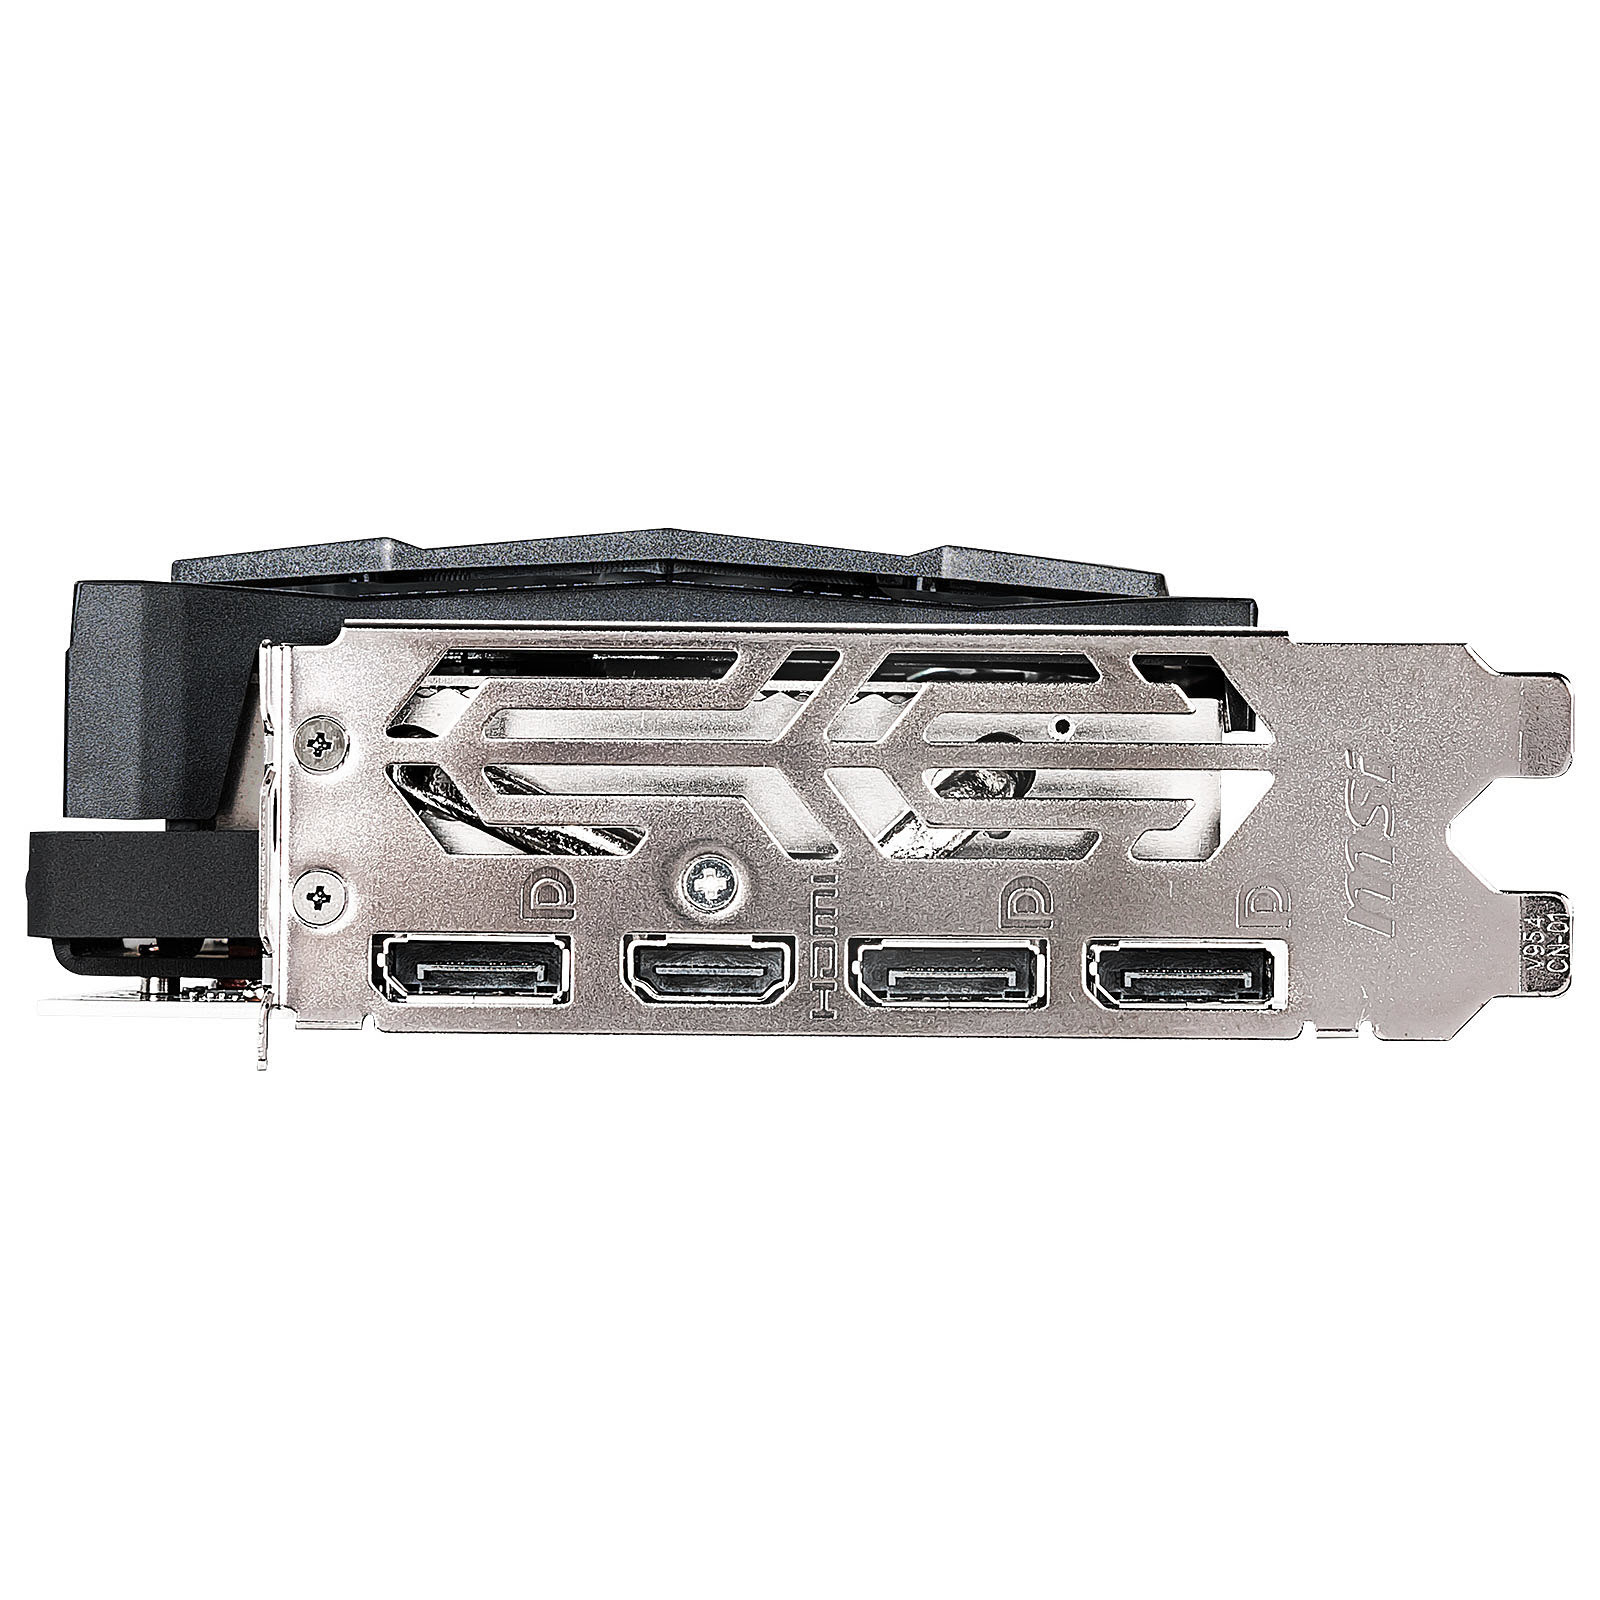 MSI RTX 2060 SUPER GAMING X 8Go - Carte graphique MSI - 1